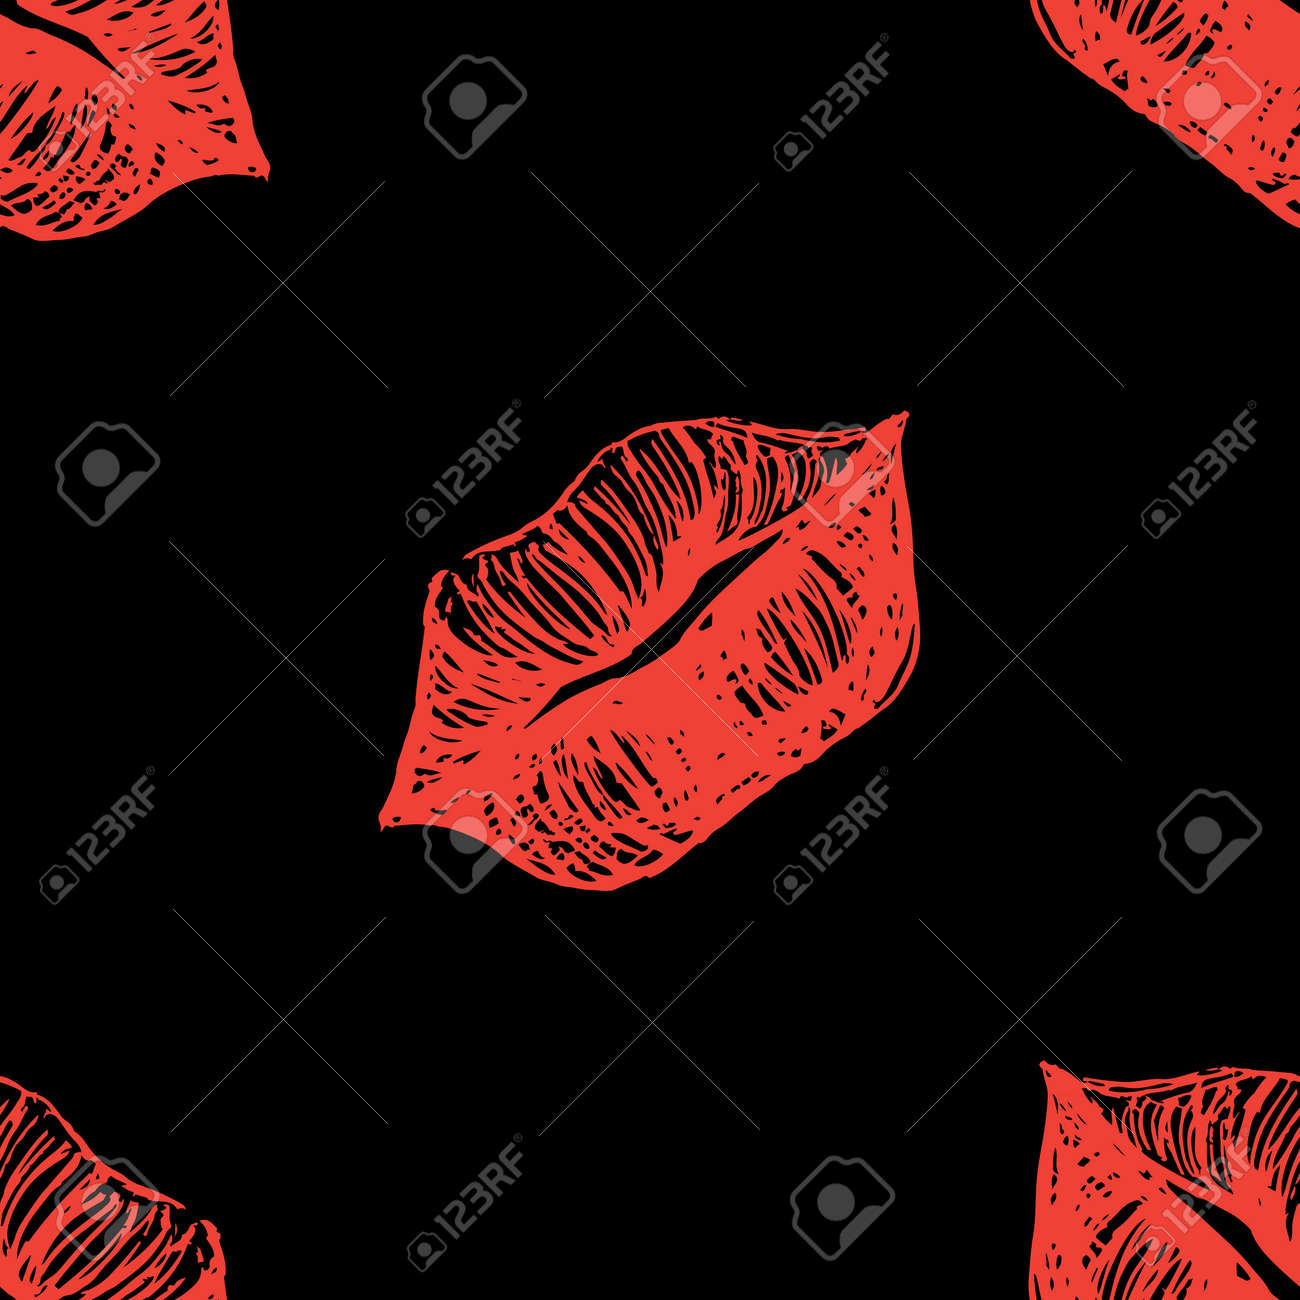 Black Lips Background